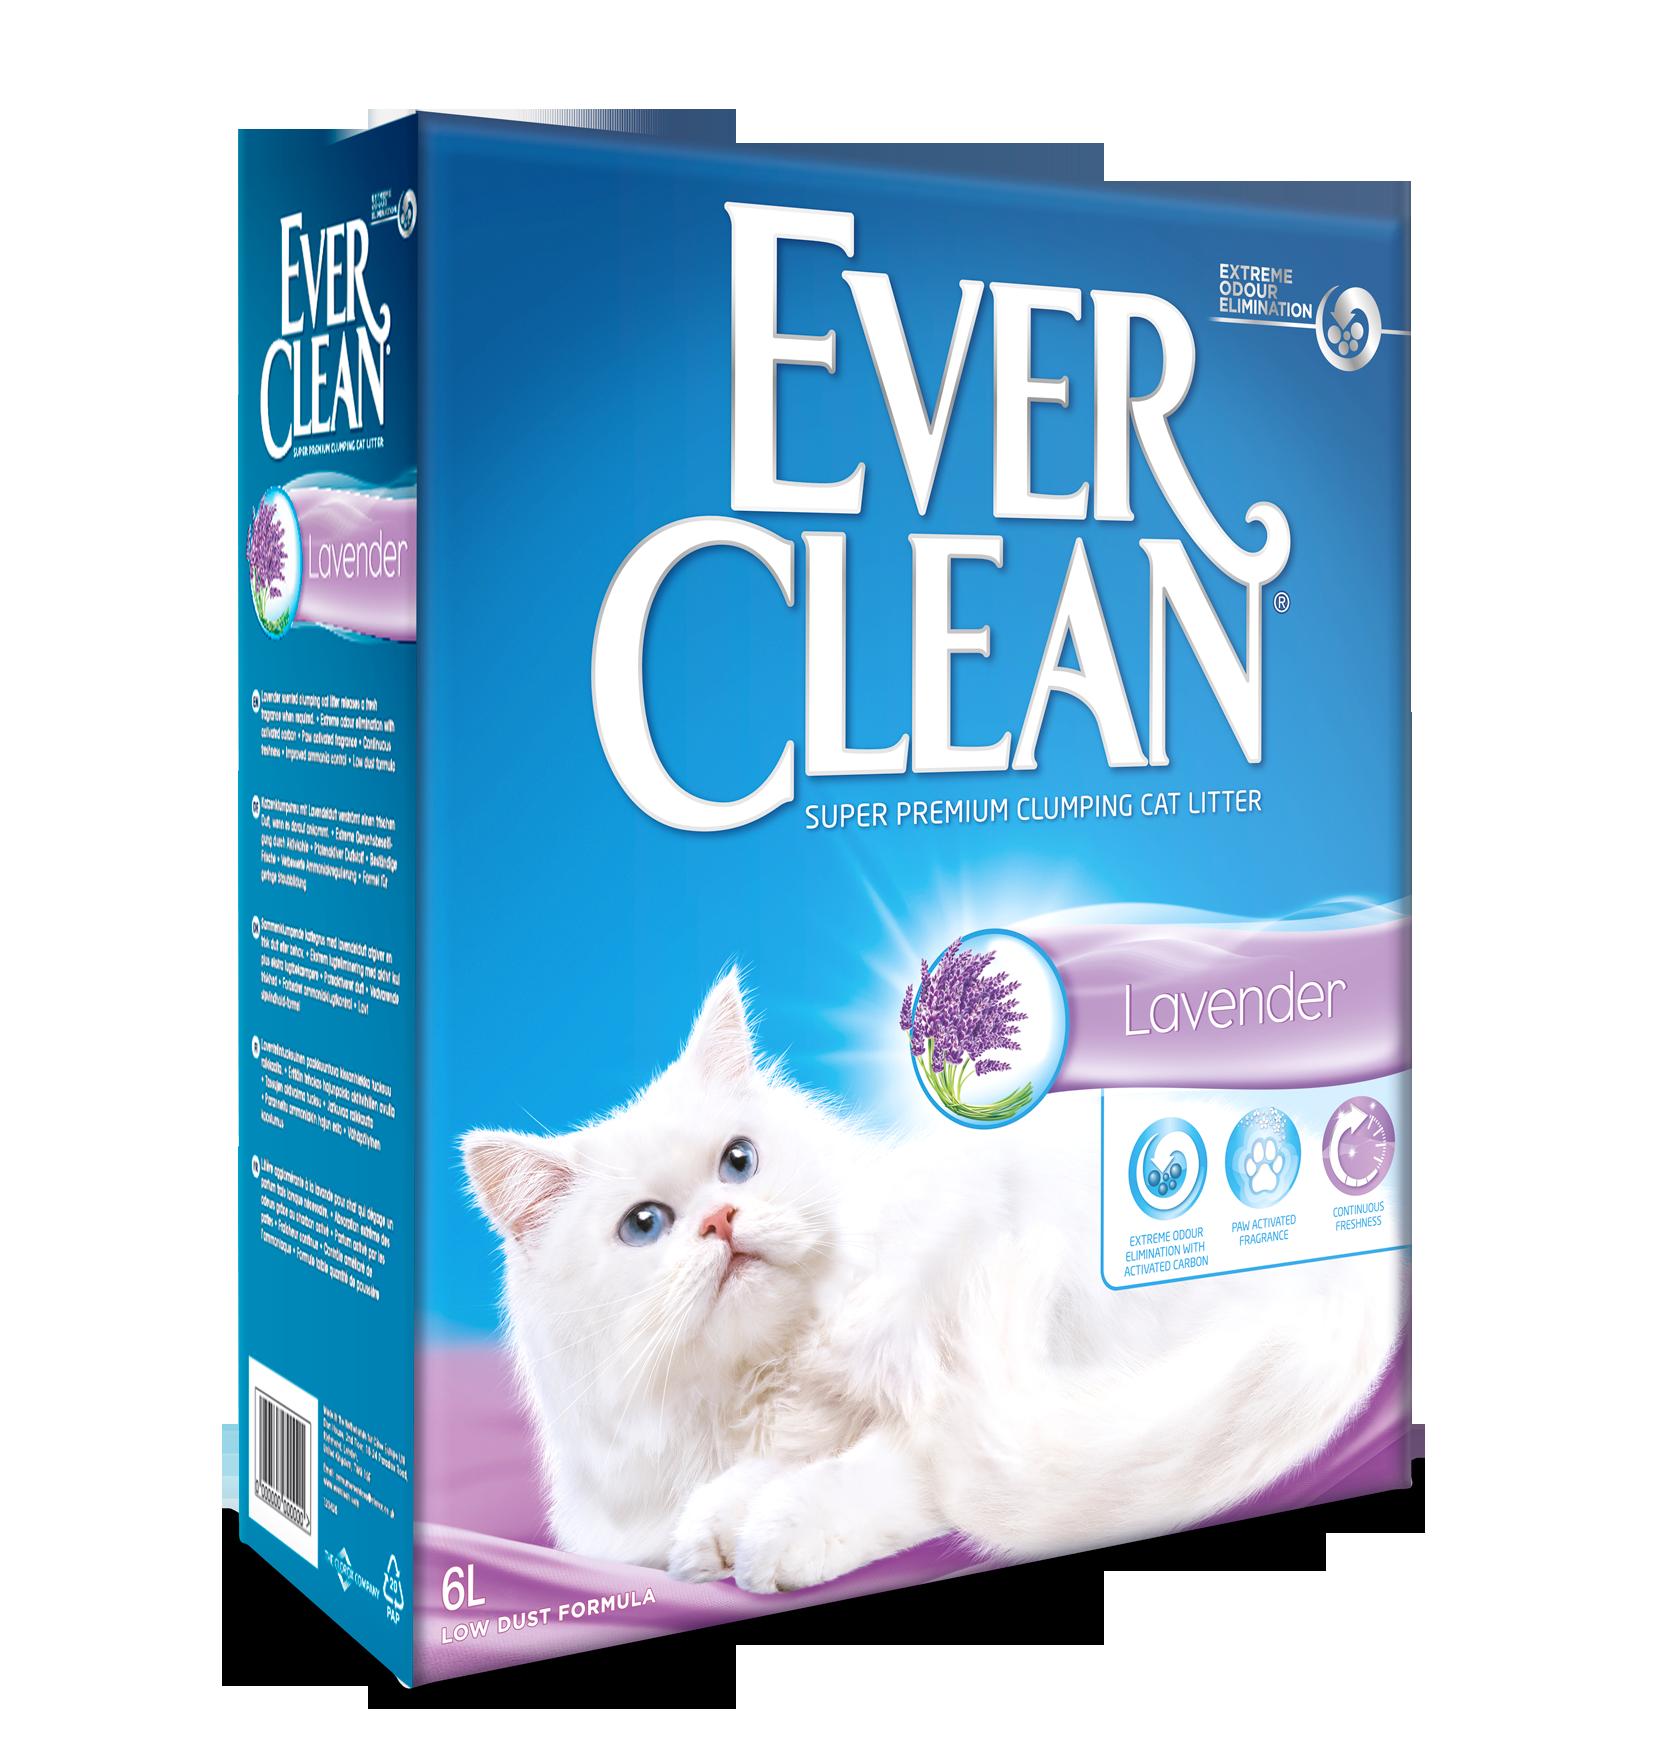 EVER CLEAN Lavendel 6L